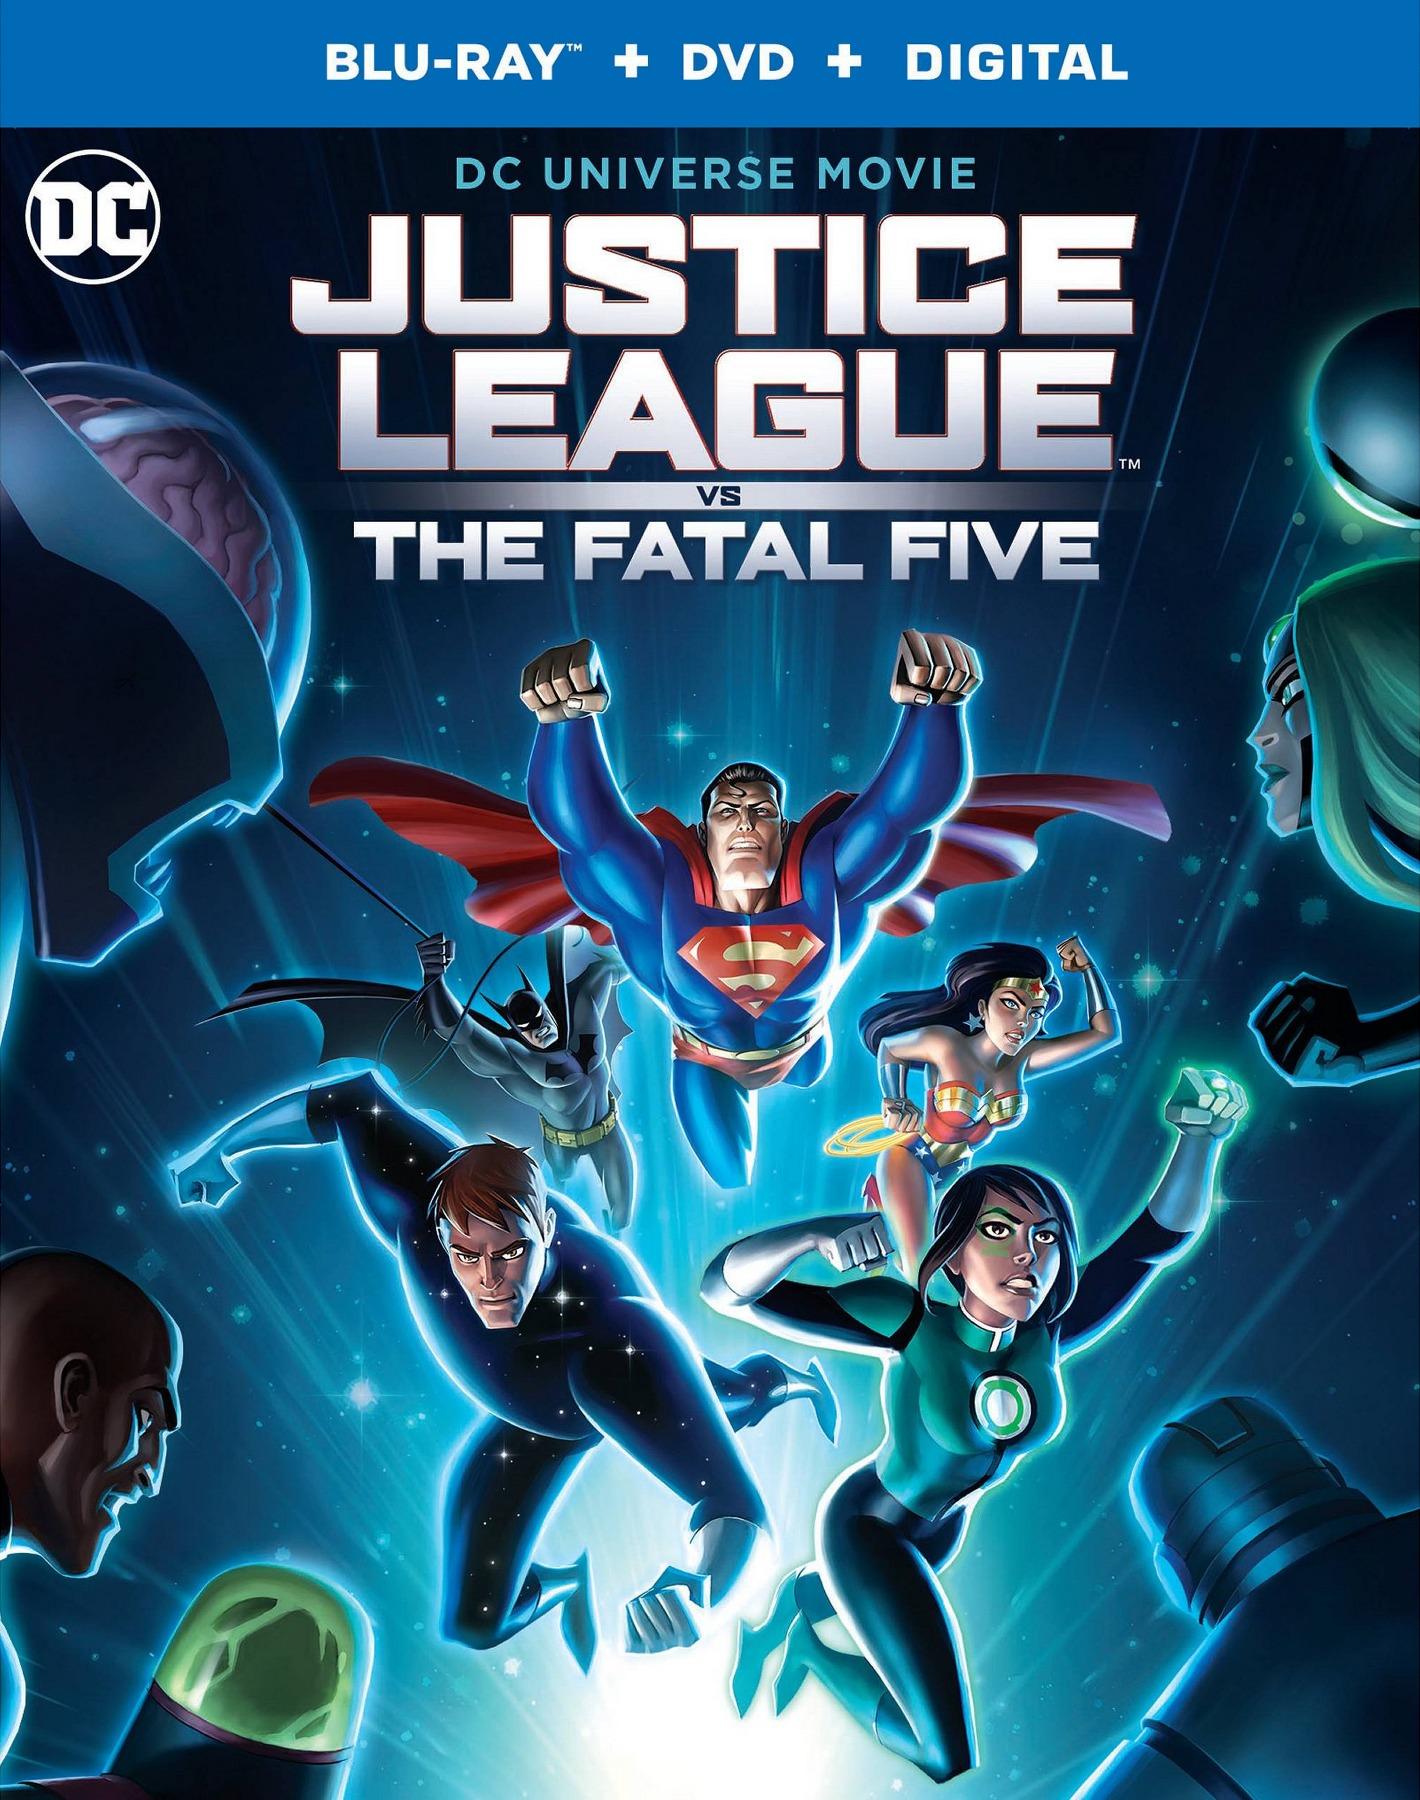 Justice League vs the Fatal Five (Blu-ray)(Region Free)(Pre-order / Apr 16)